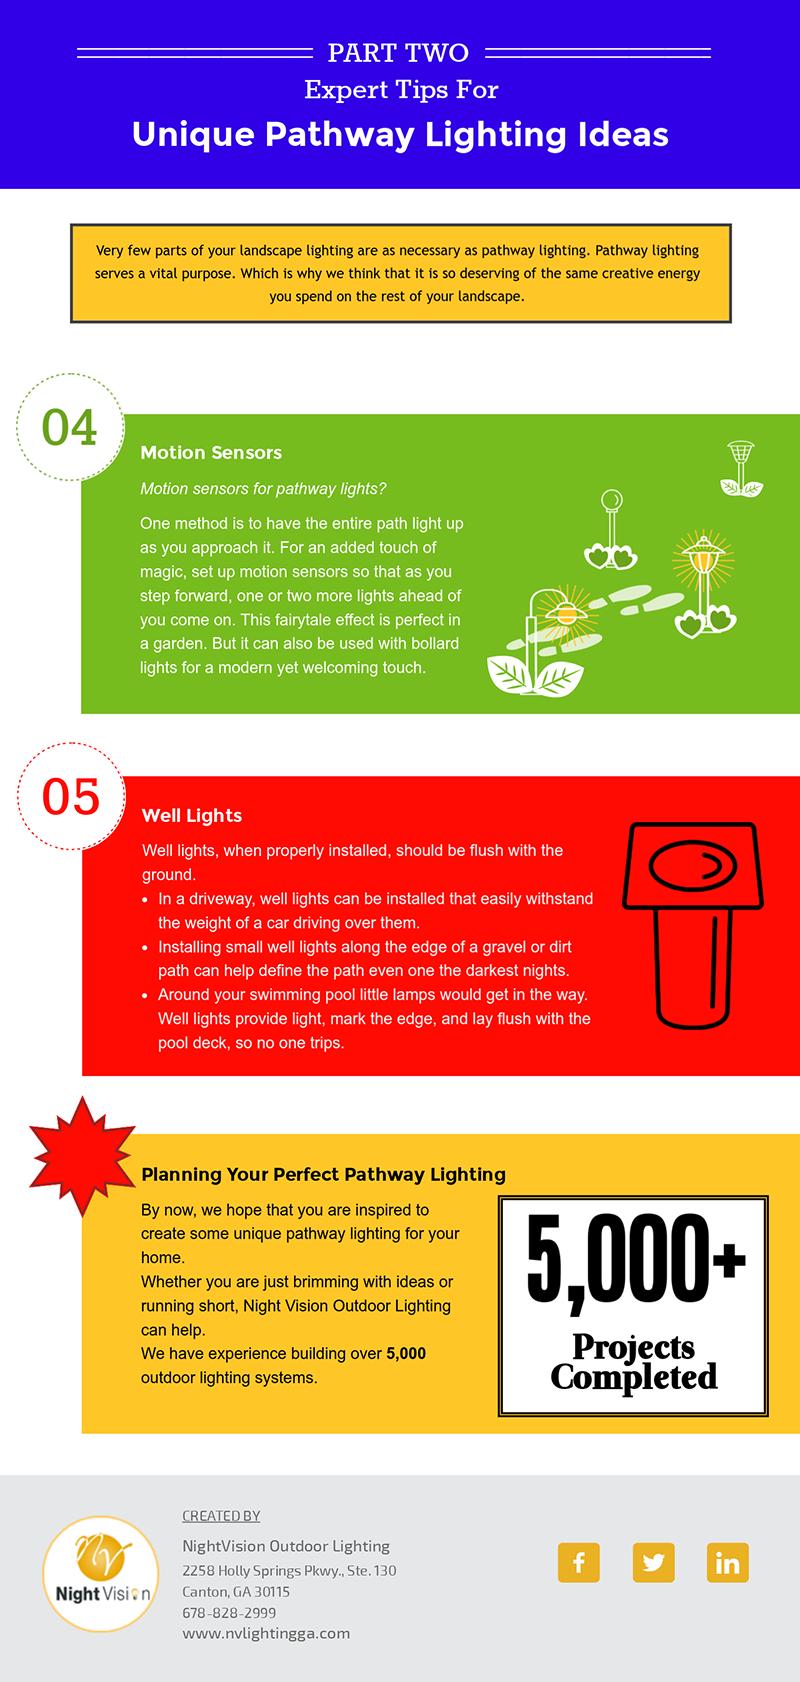 Unique Pathway Lighting Ideas - Part 2 [infographic]